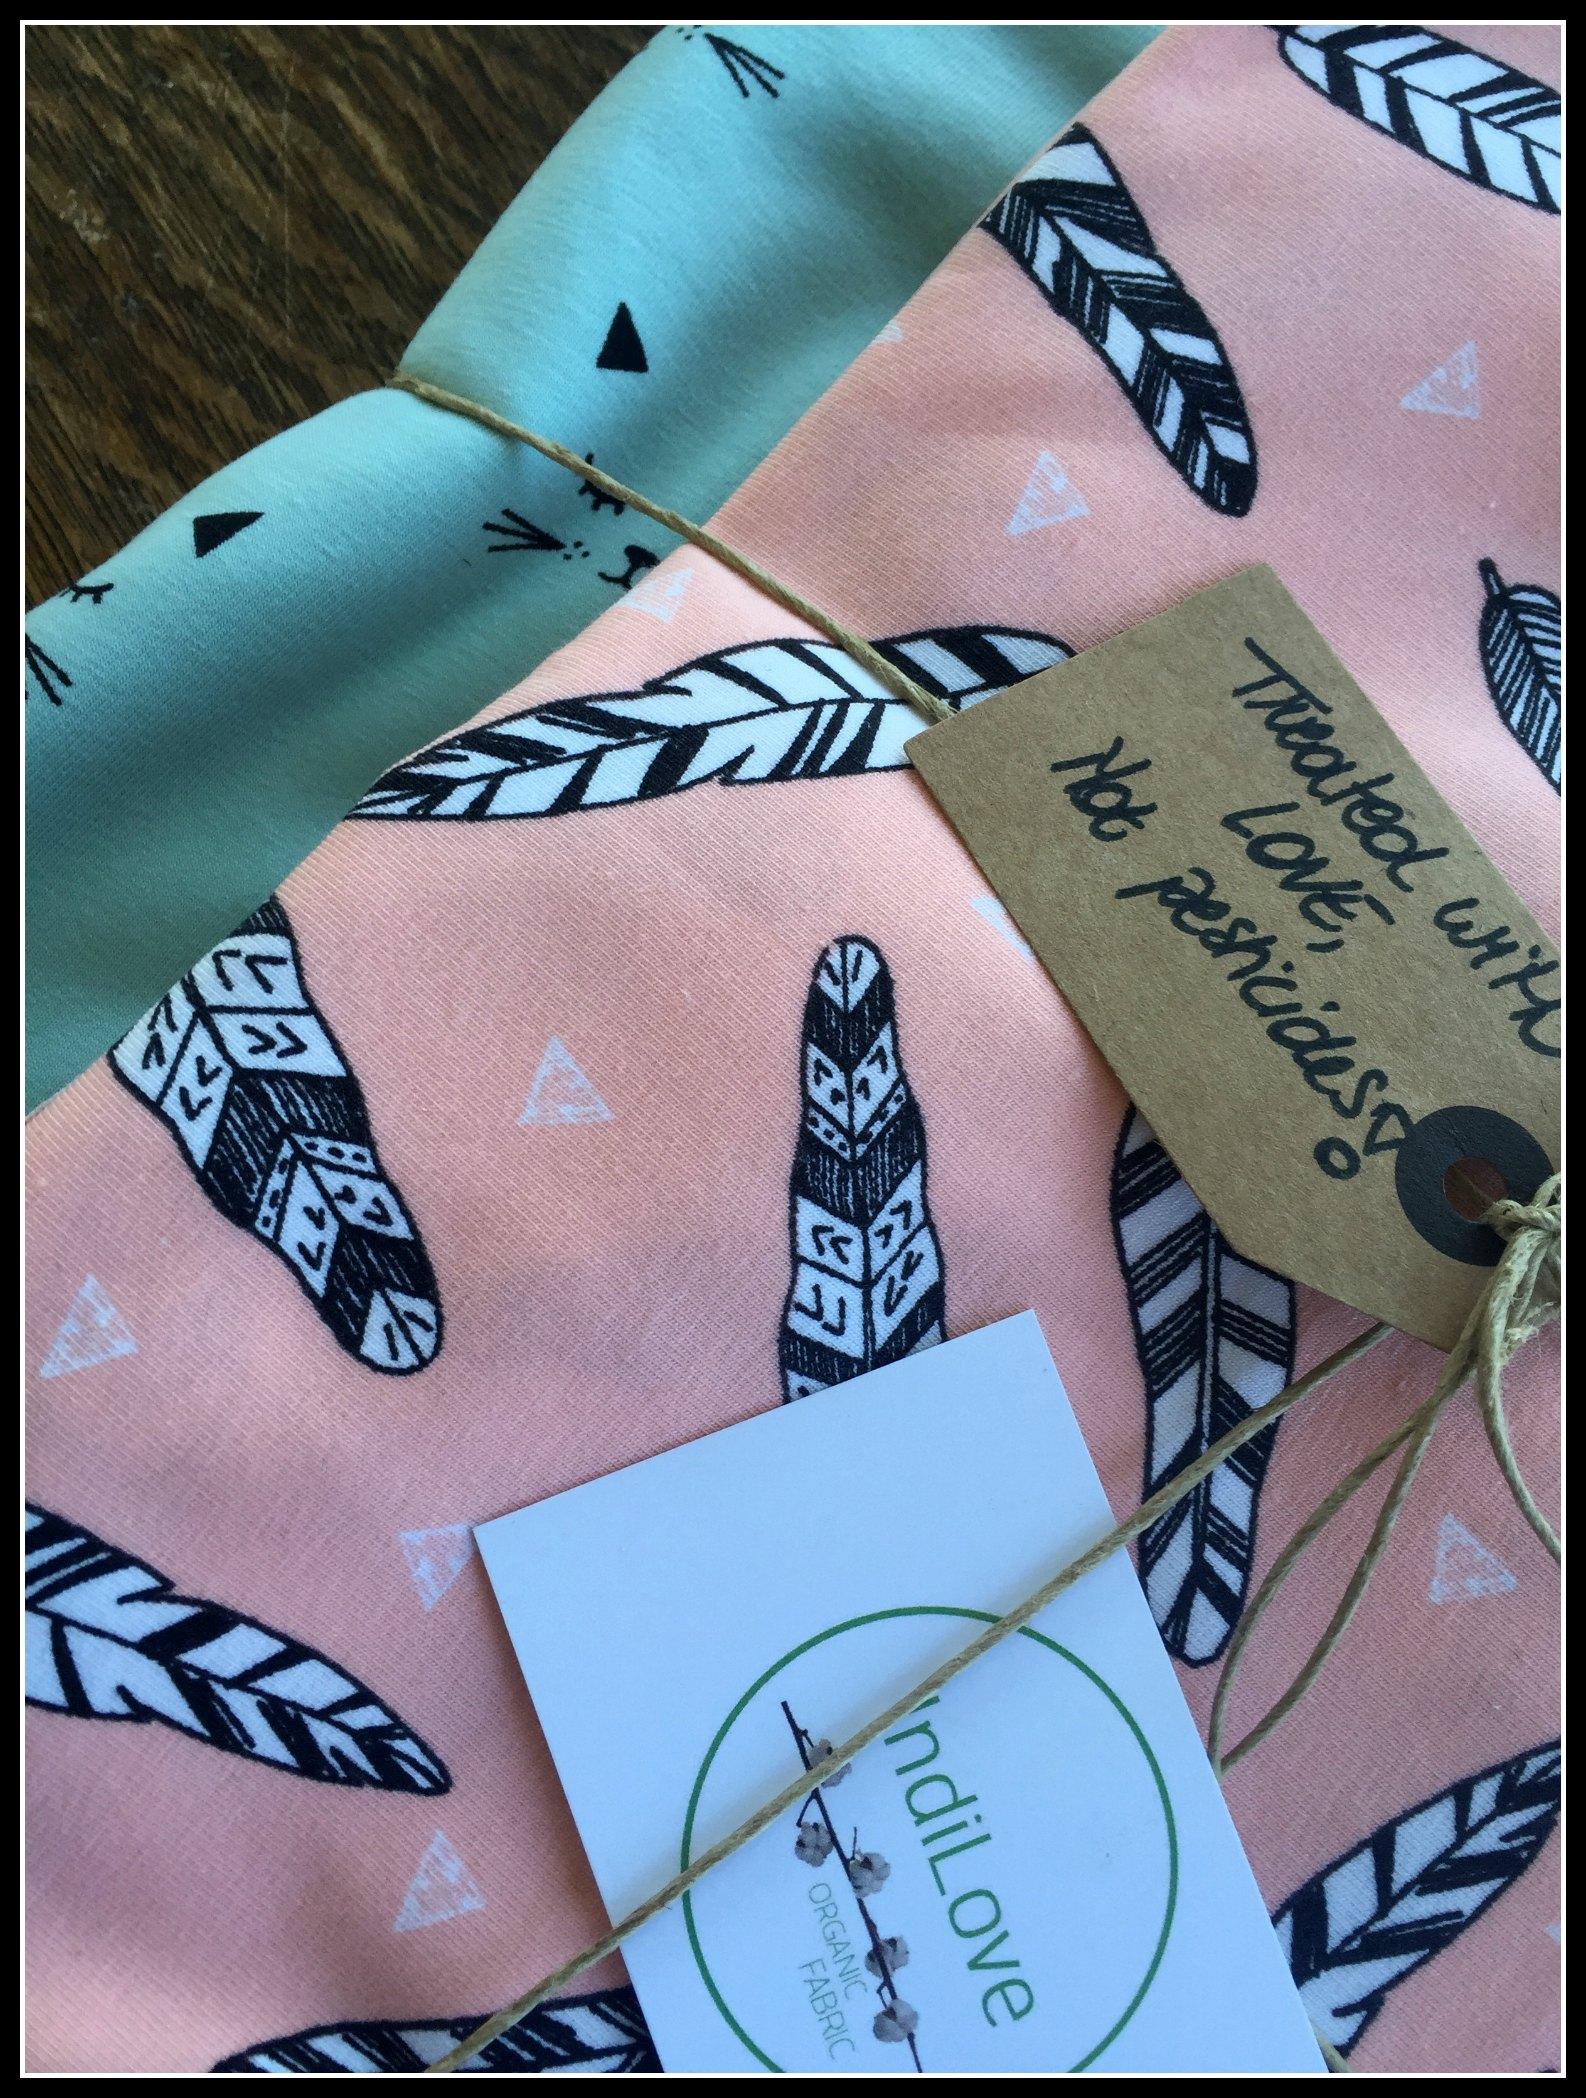 MarieCadie.com Indilove fabrics